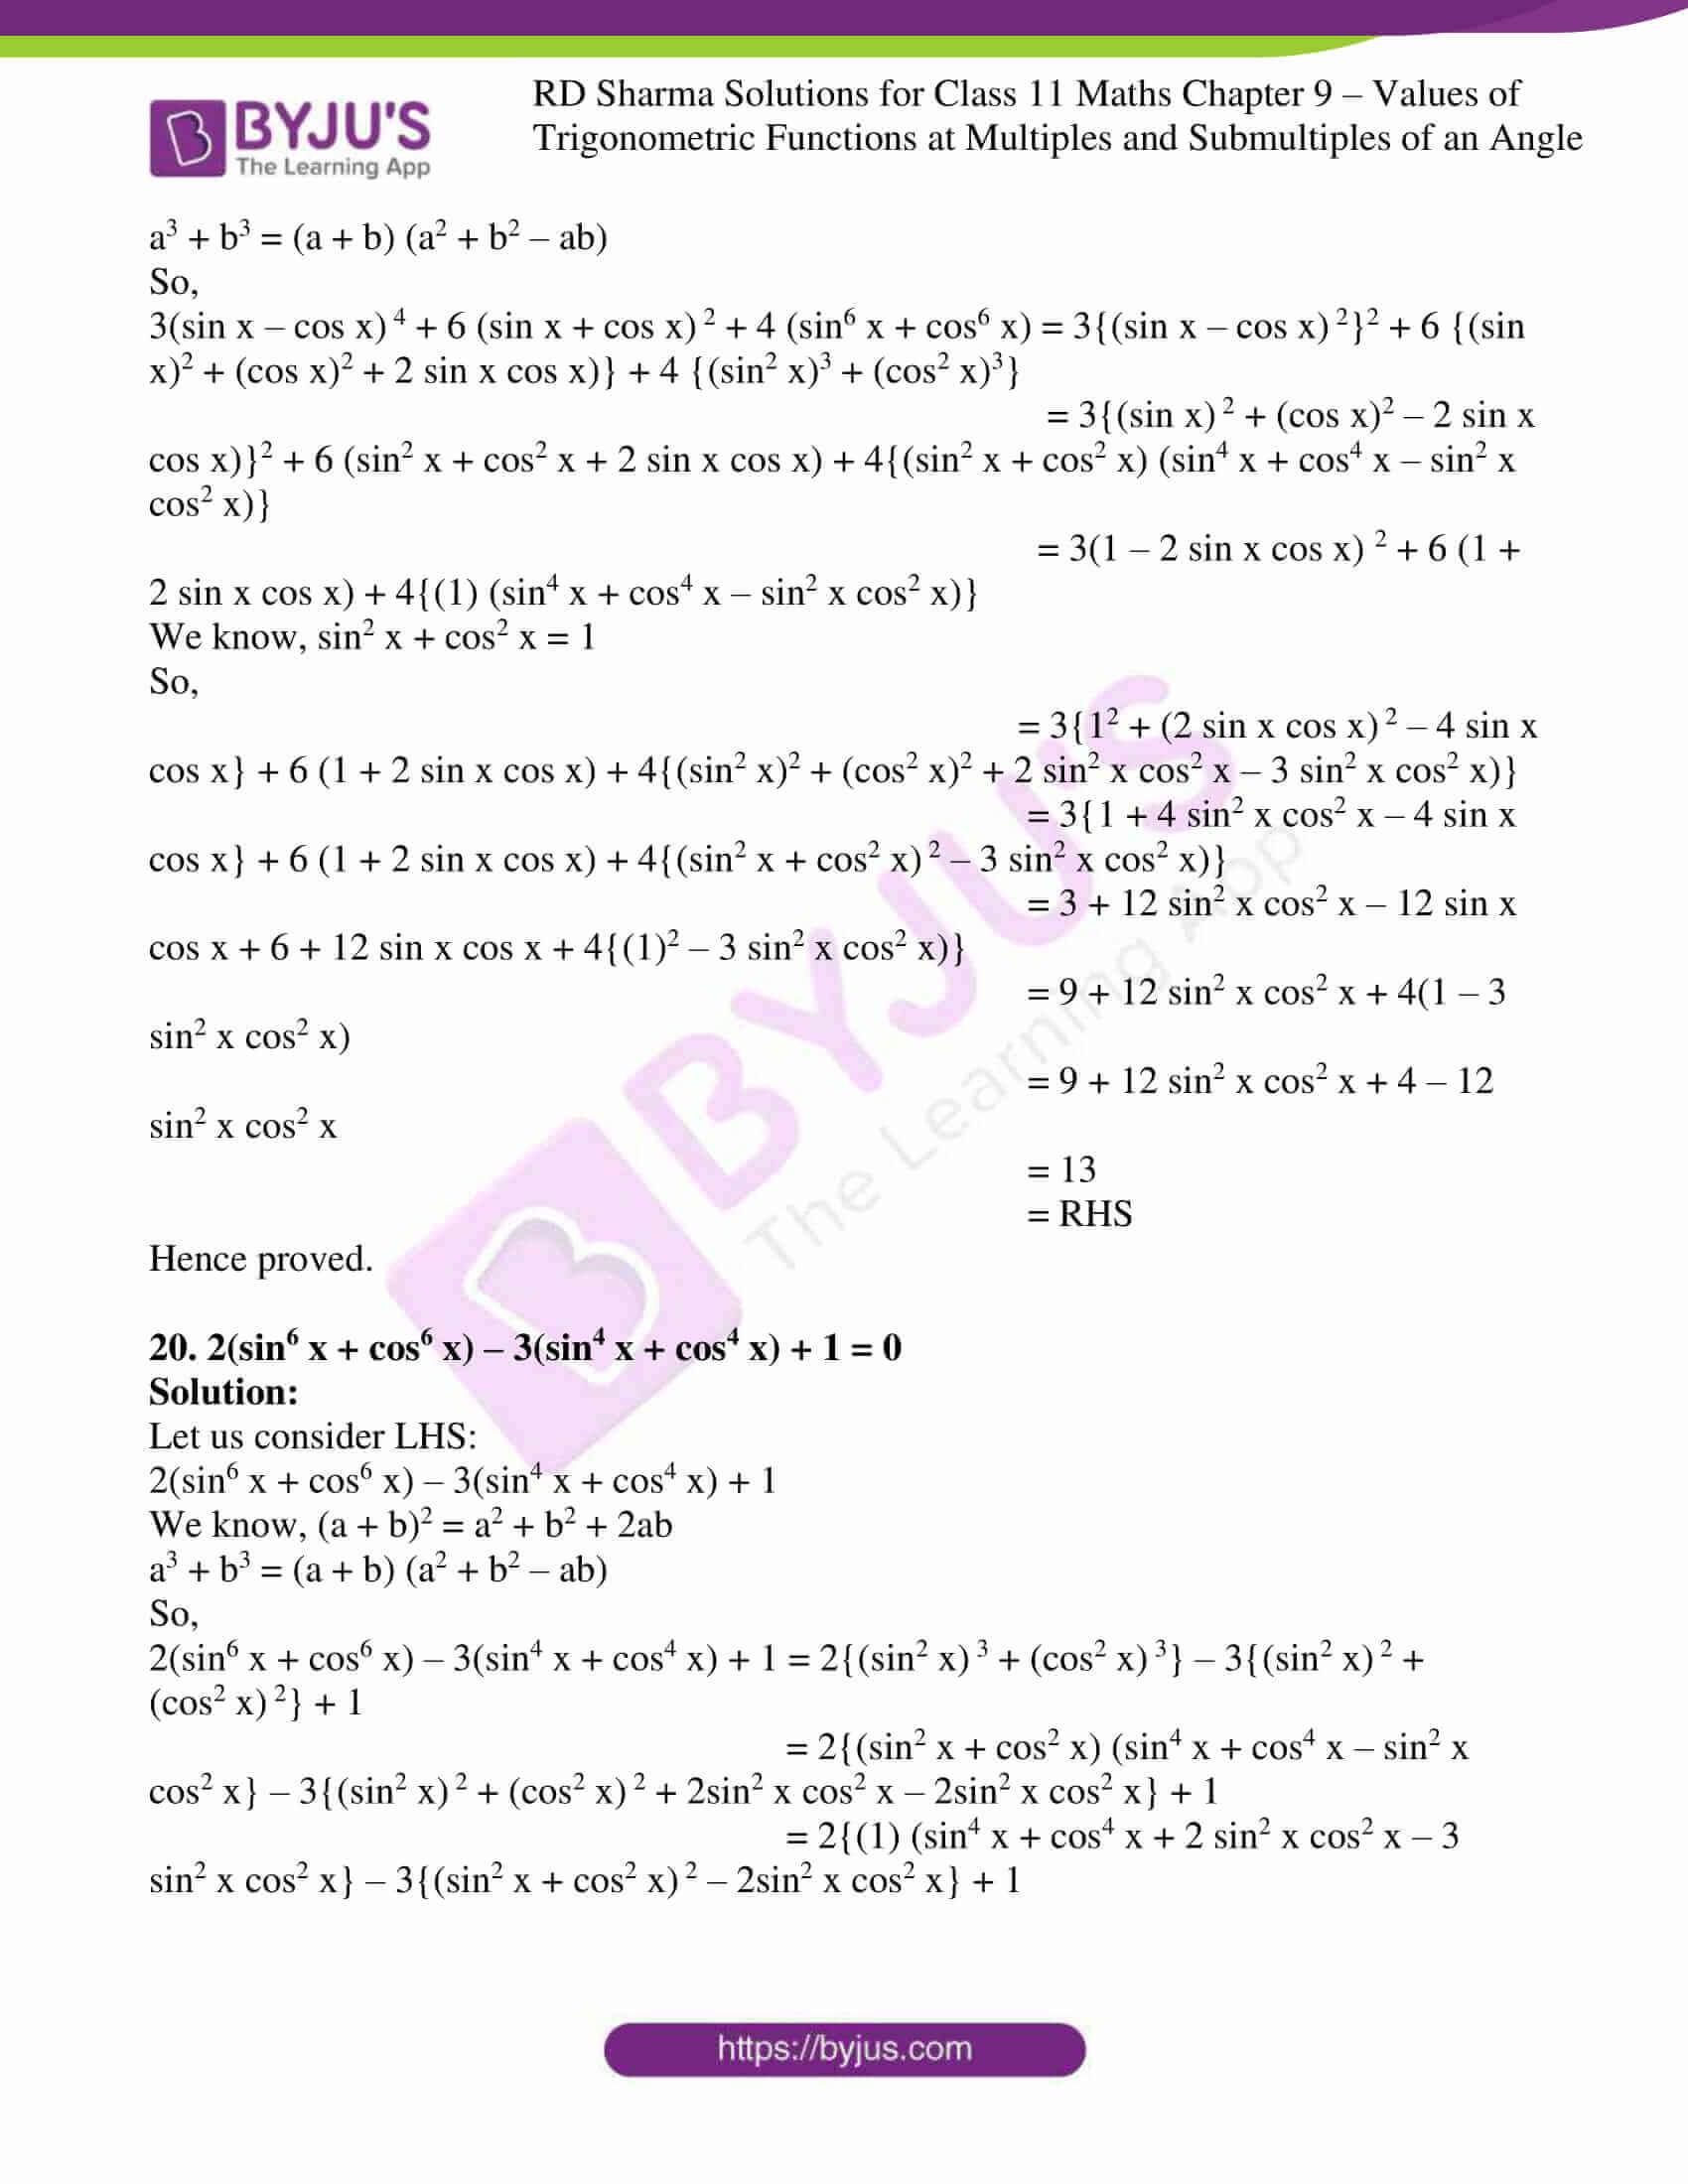 rd sharma class 11 maths ch 9 ex 1 12